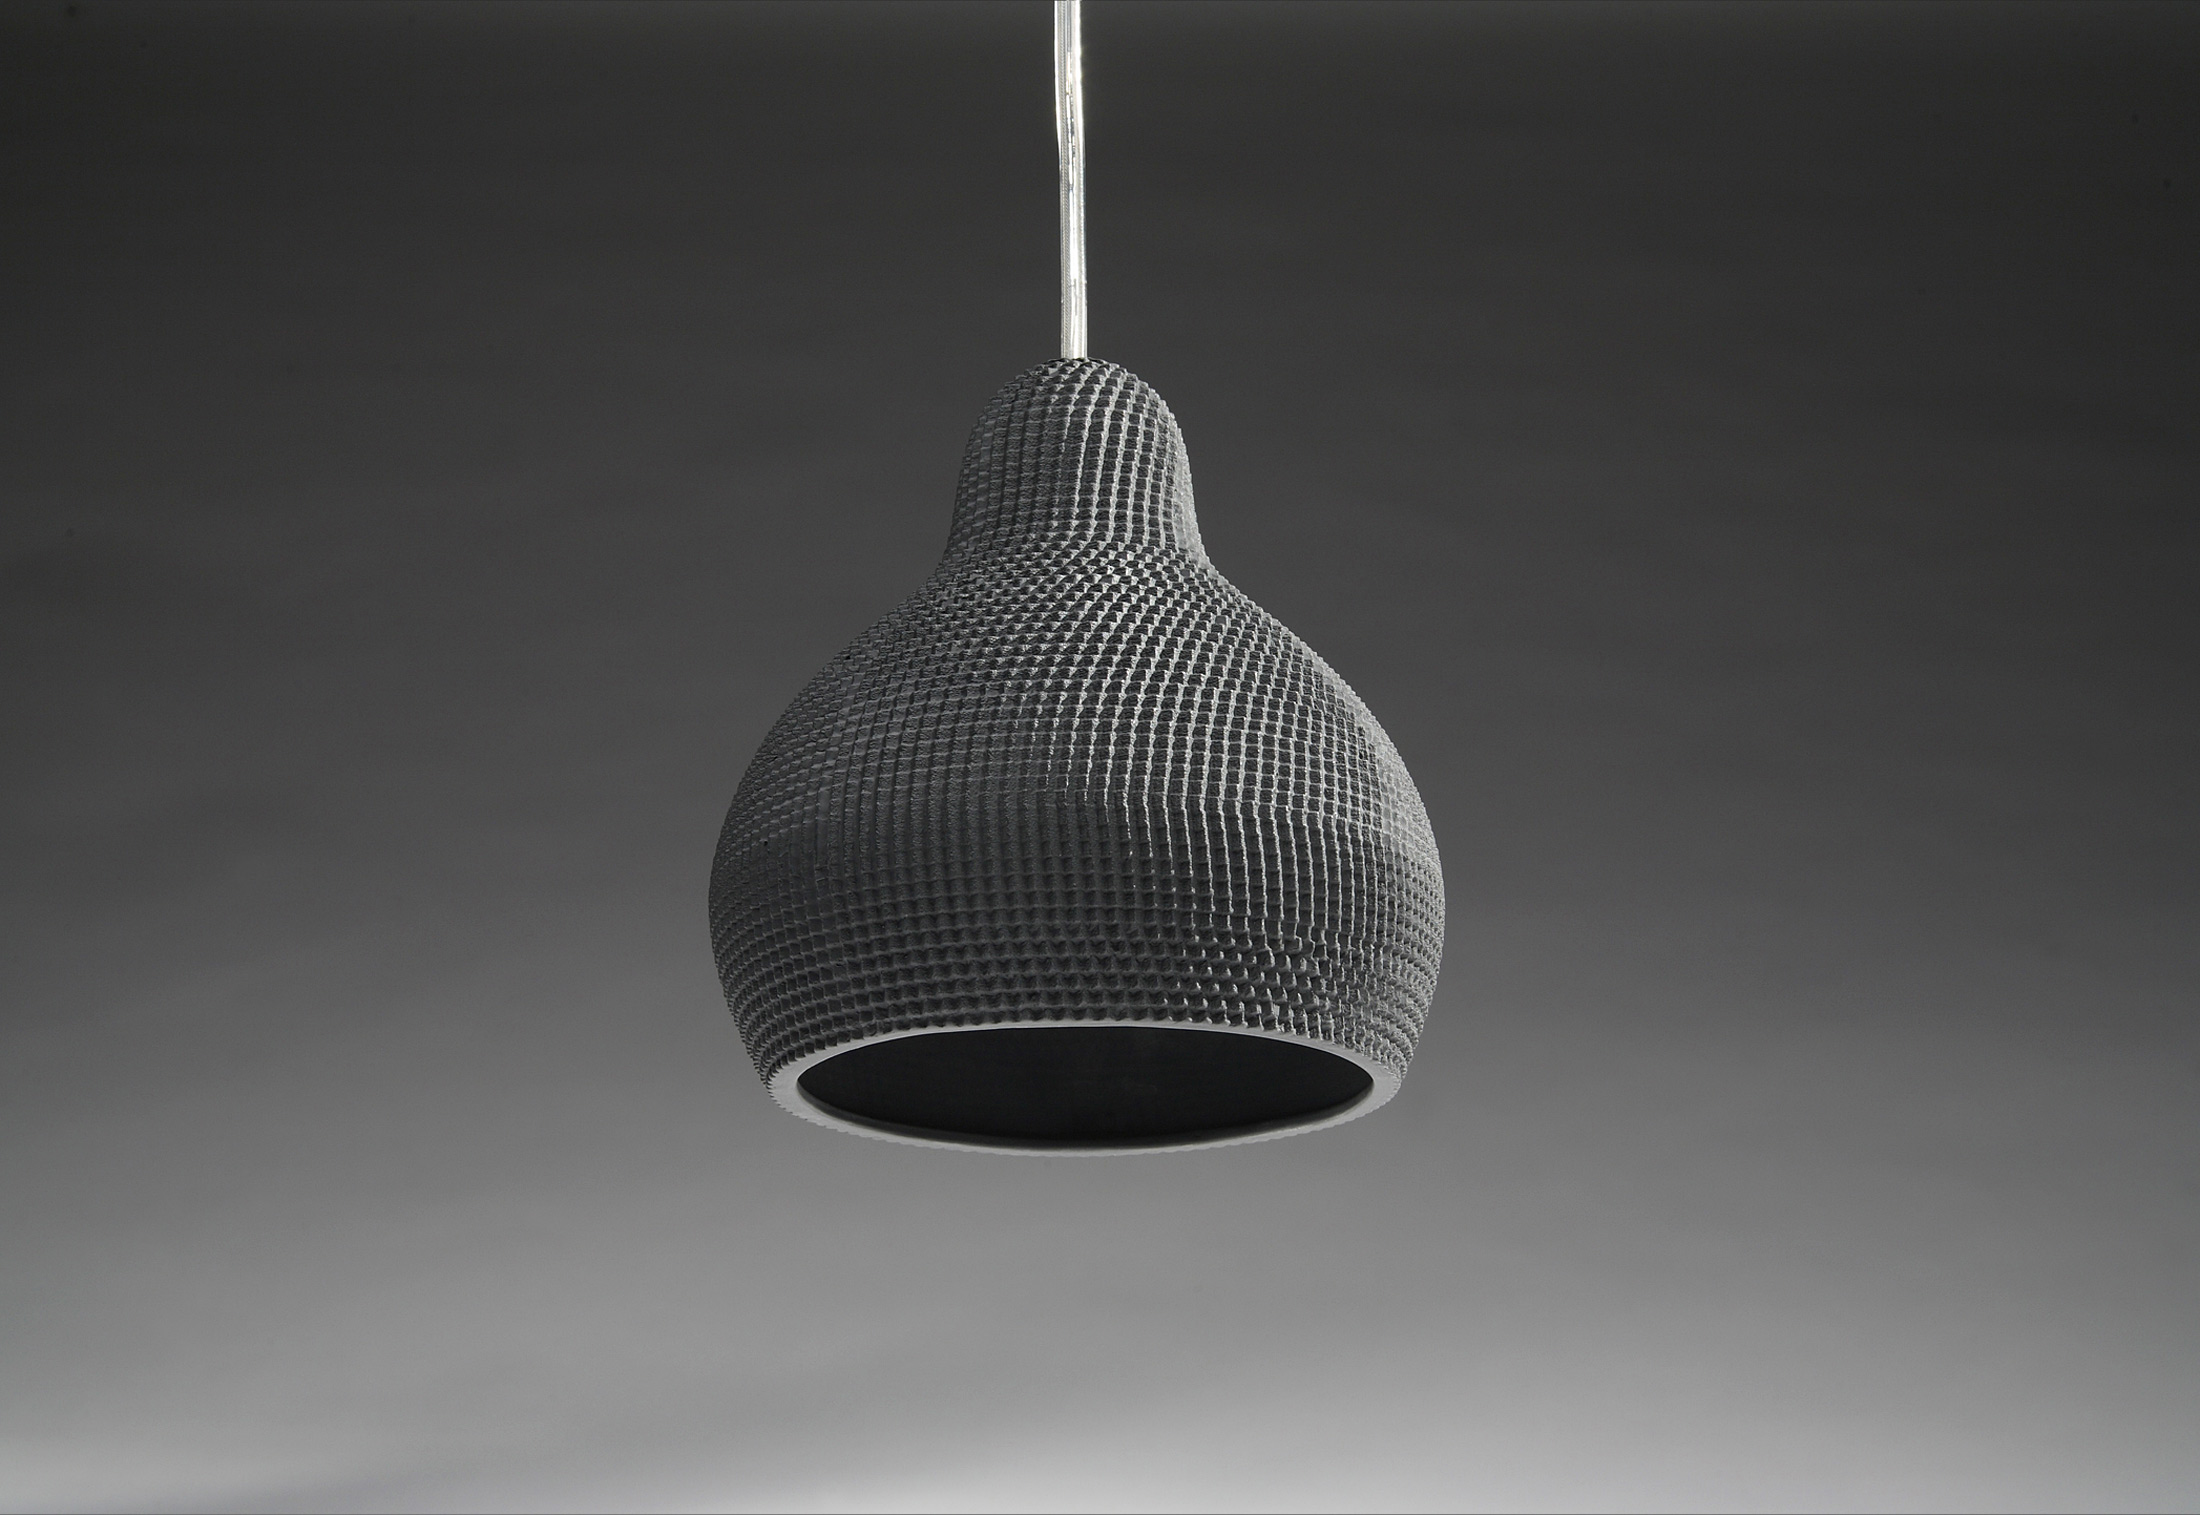 lampe-144dpi-4 Spannende Lampen Frankfurt Am Main Dekorationen